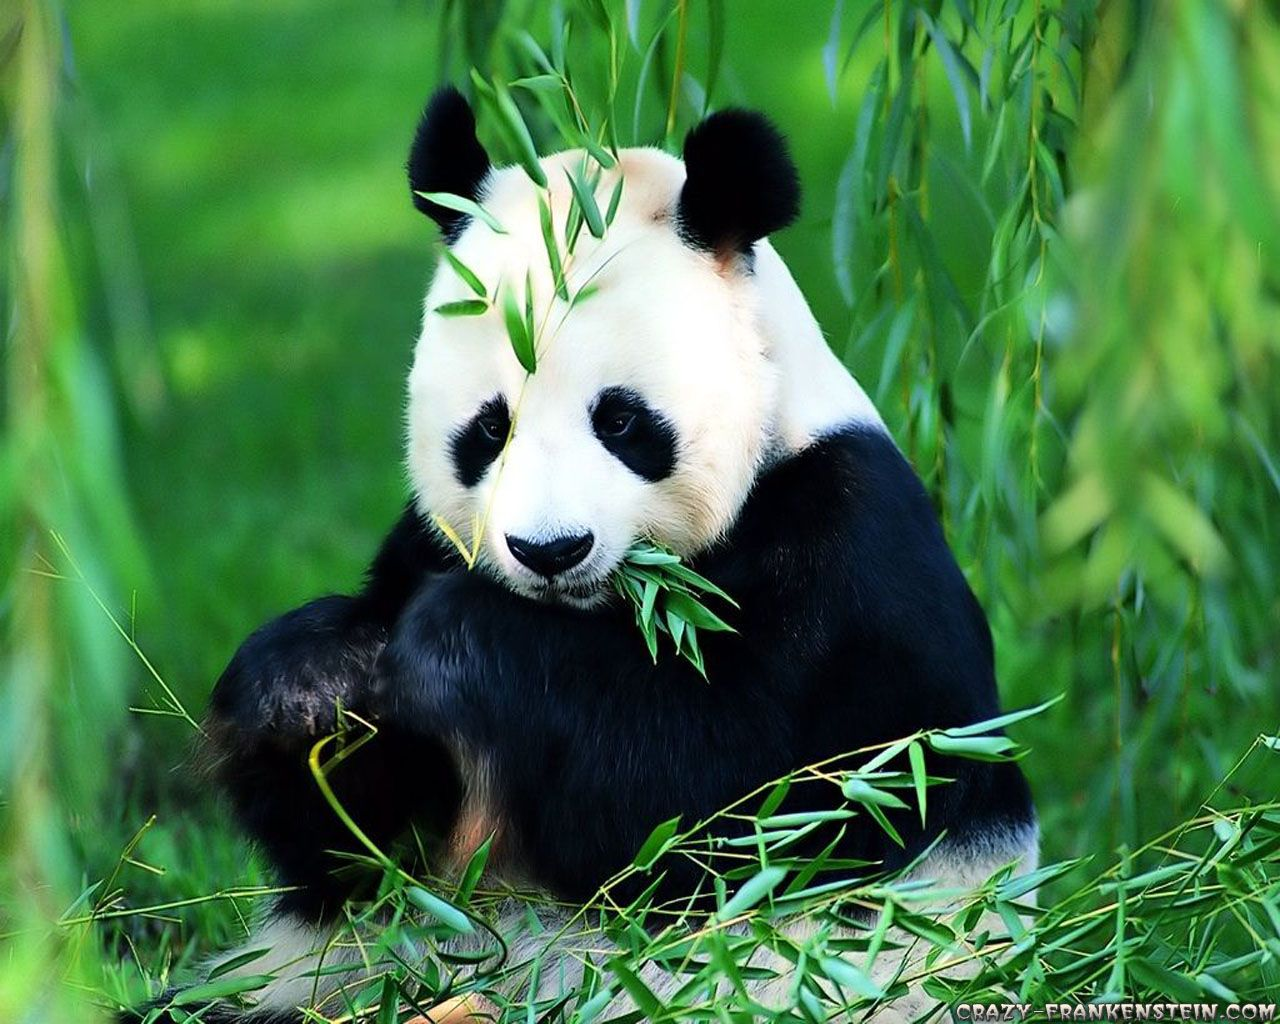 Panda Bear Wallpapers - Top Free Panda